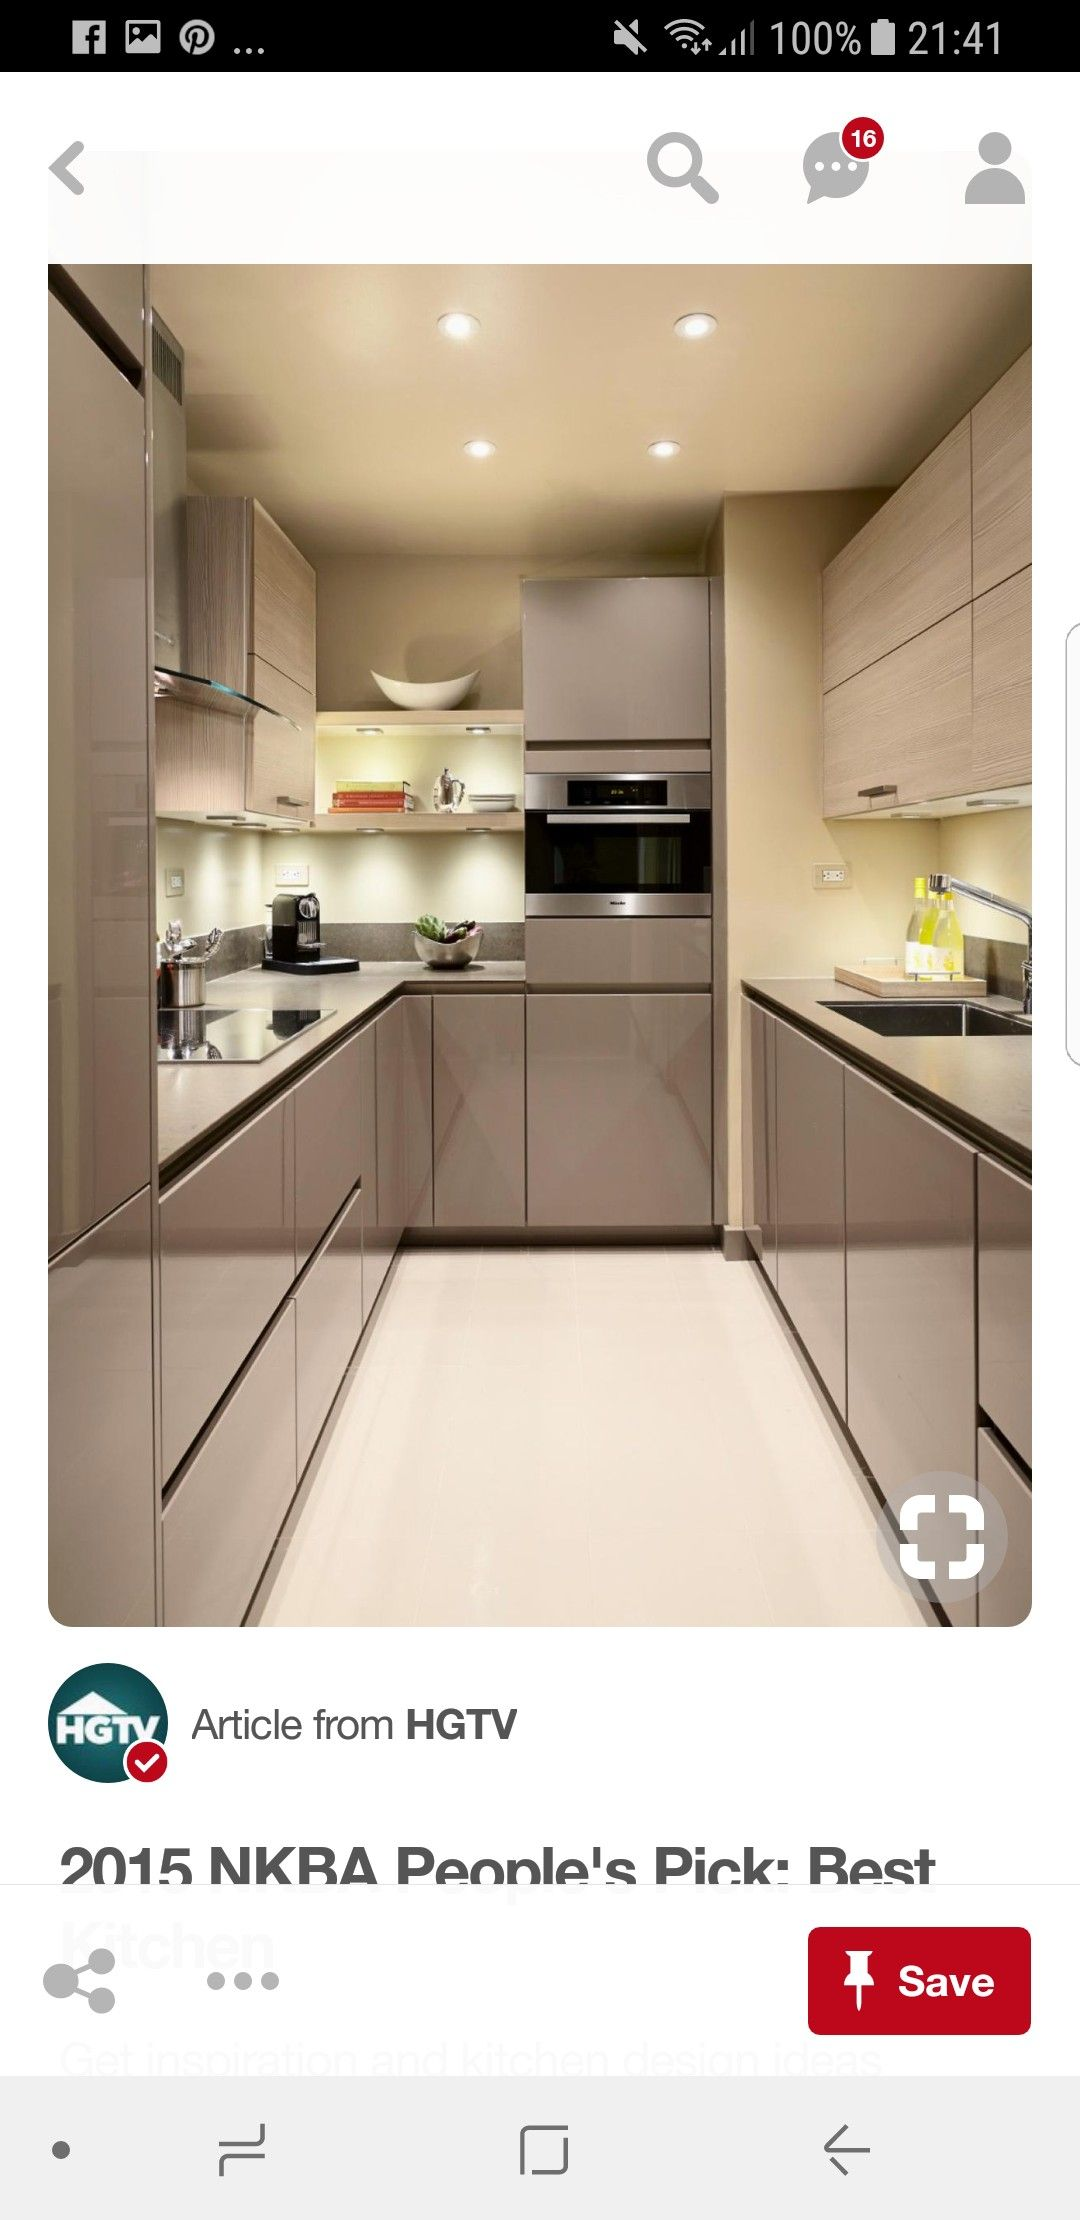 Pin di lacoo su Kuchyne | Pinterest | Cucine, Cucina e Progetti